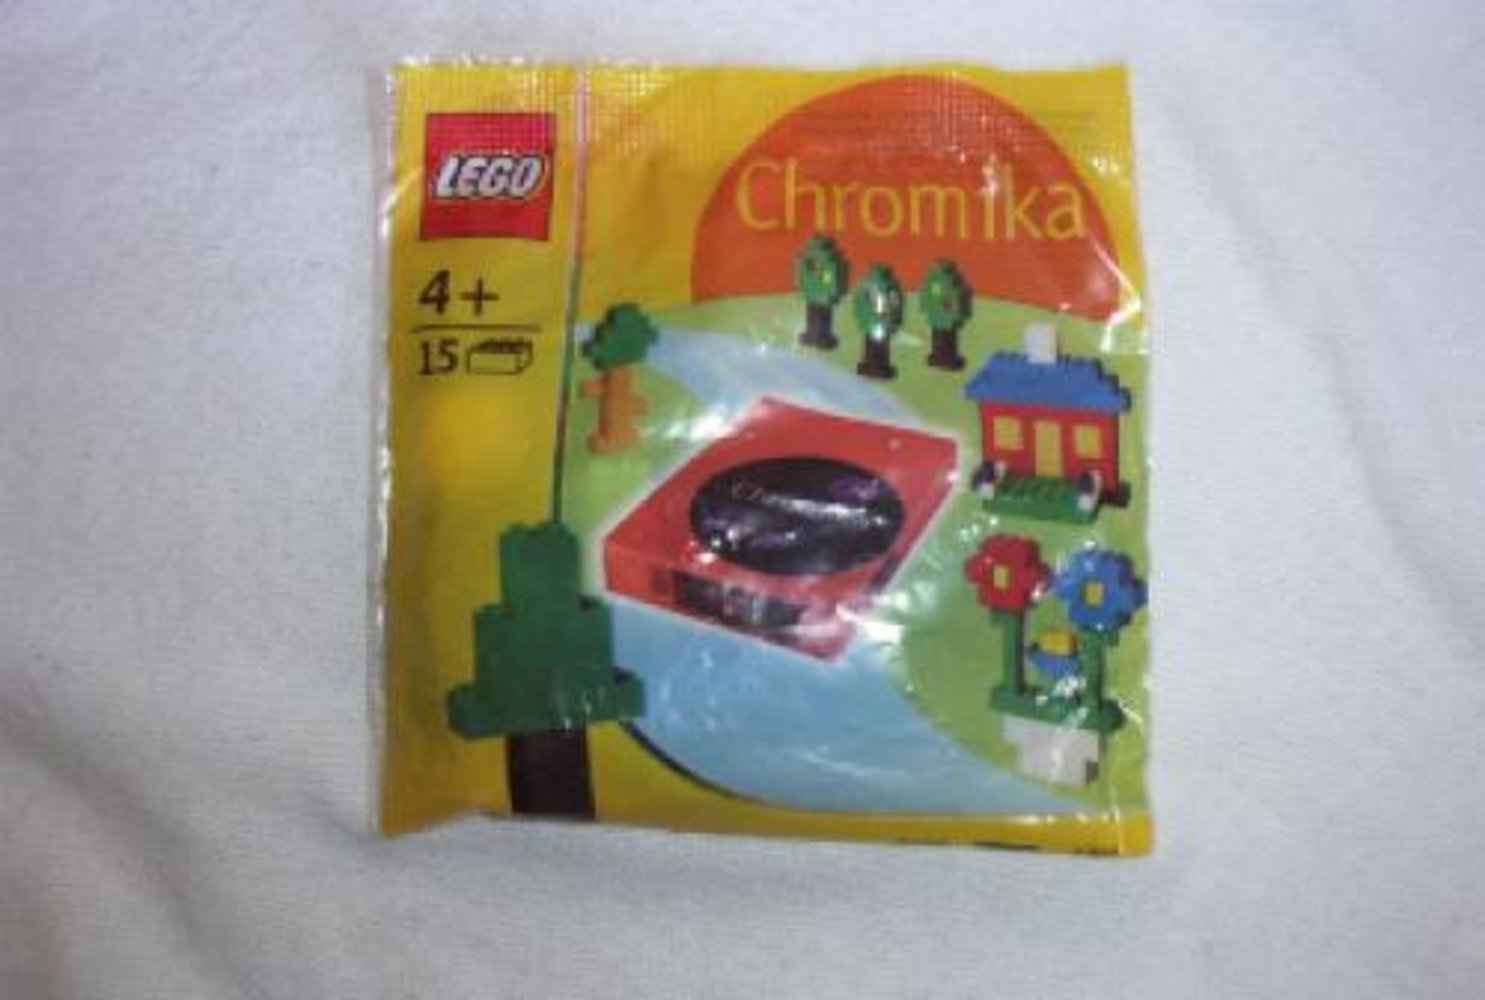 Trial Size Bag - Chromika